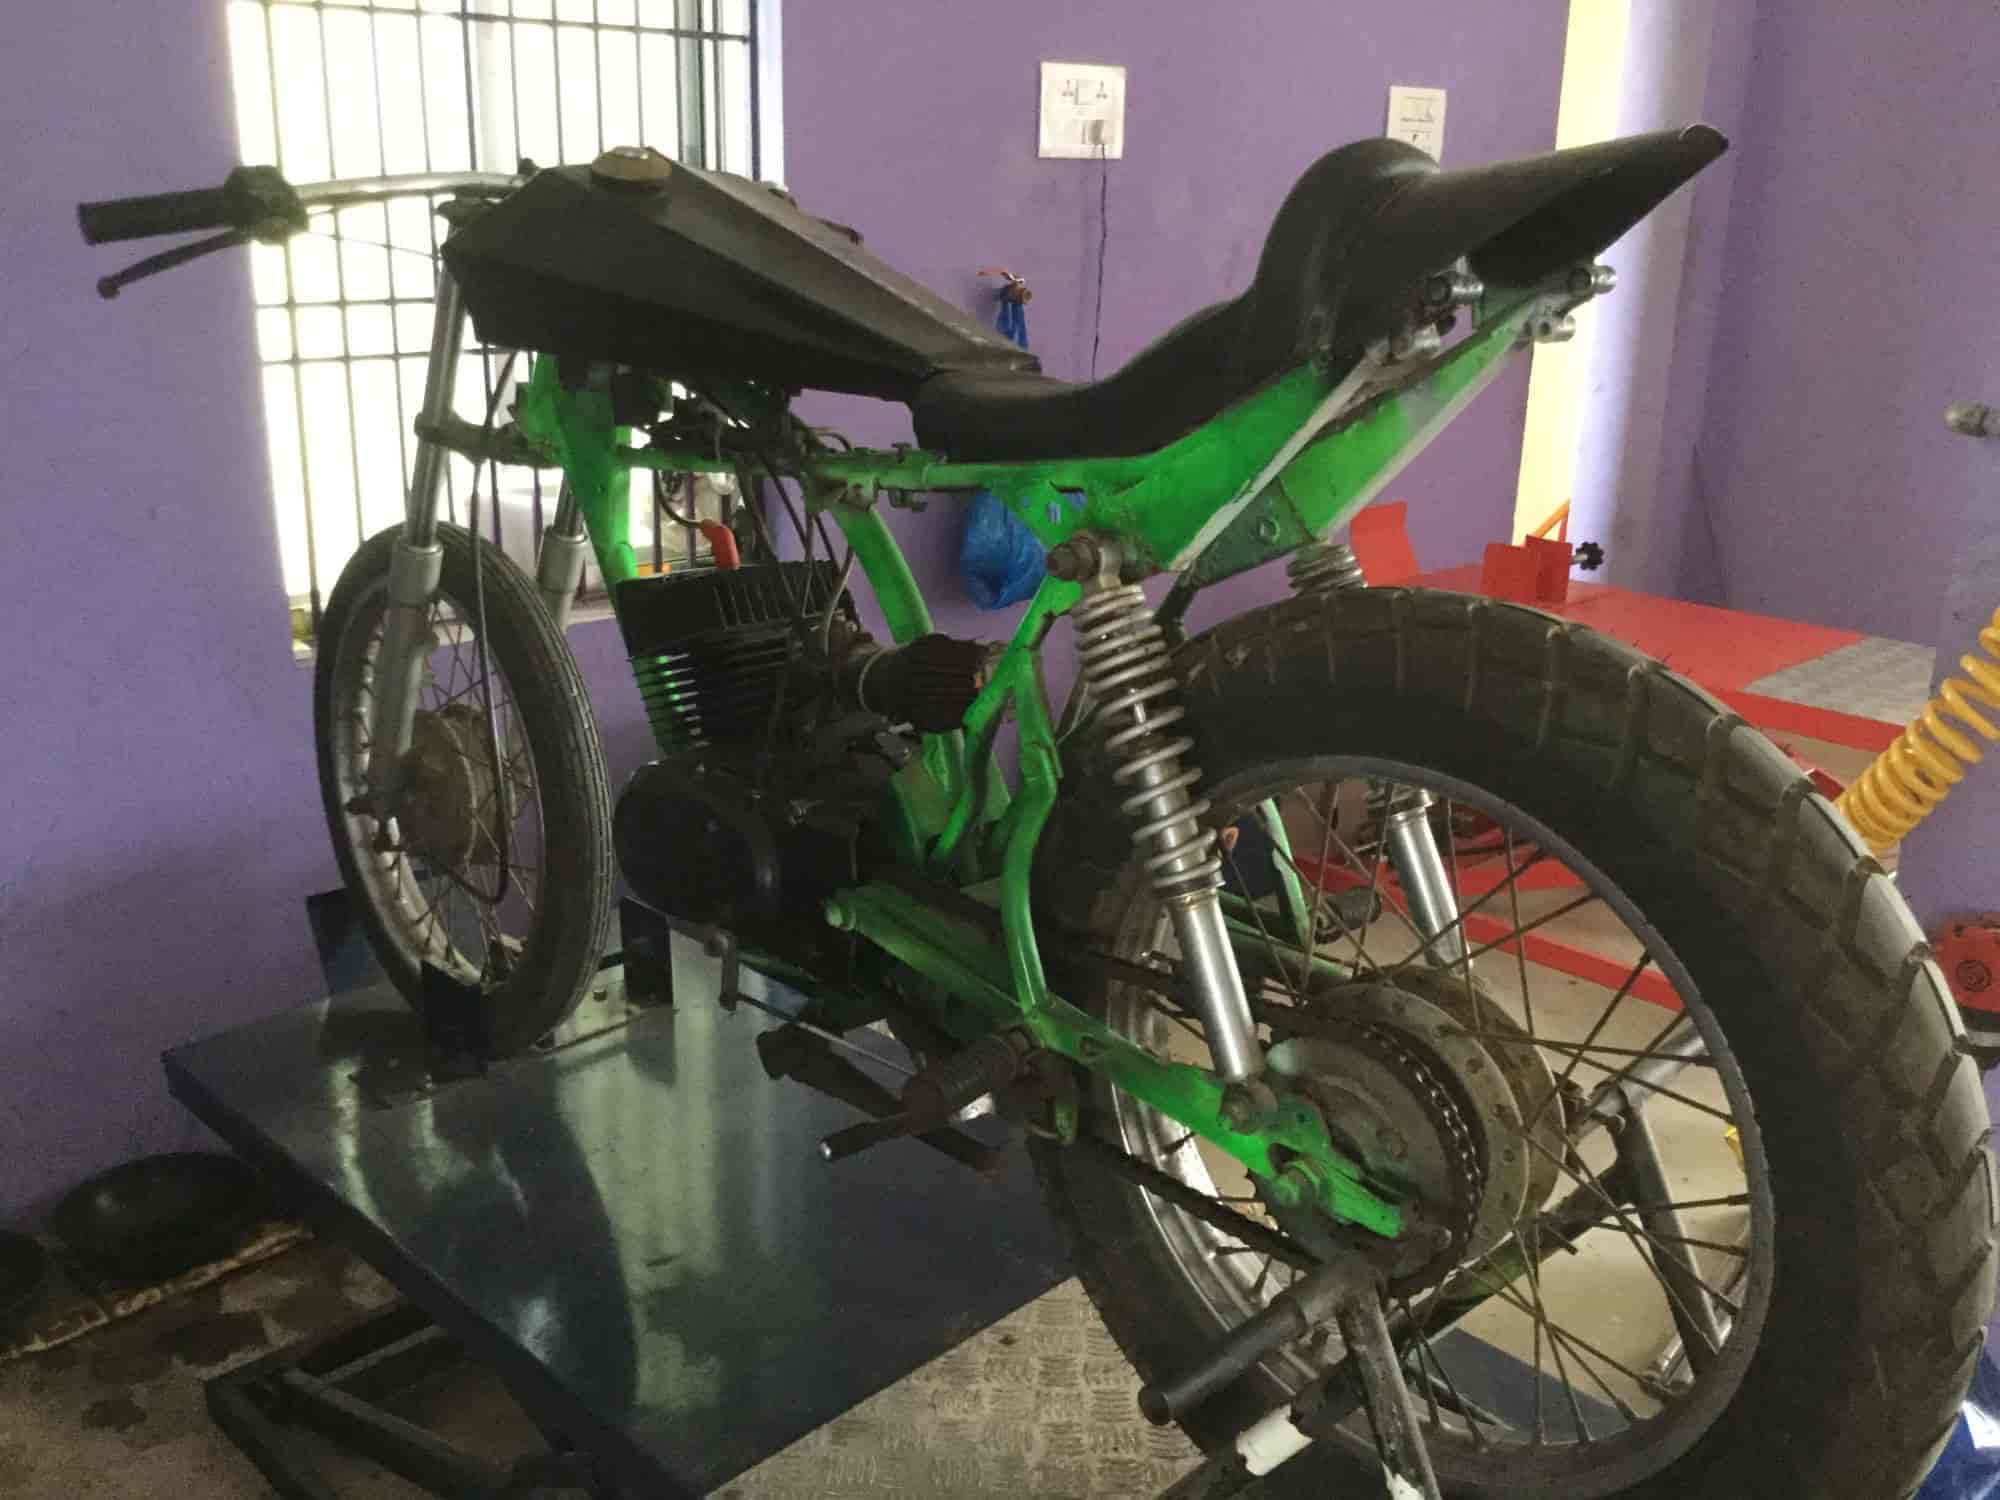 Gm Bike Care & Service Center, Nellore HO - Motorcycle